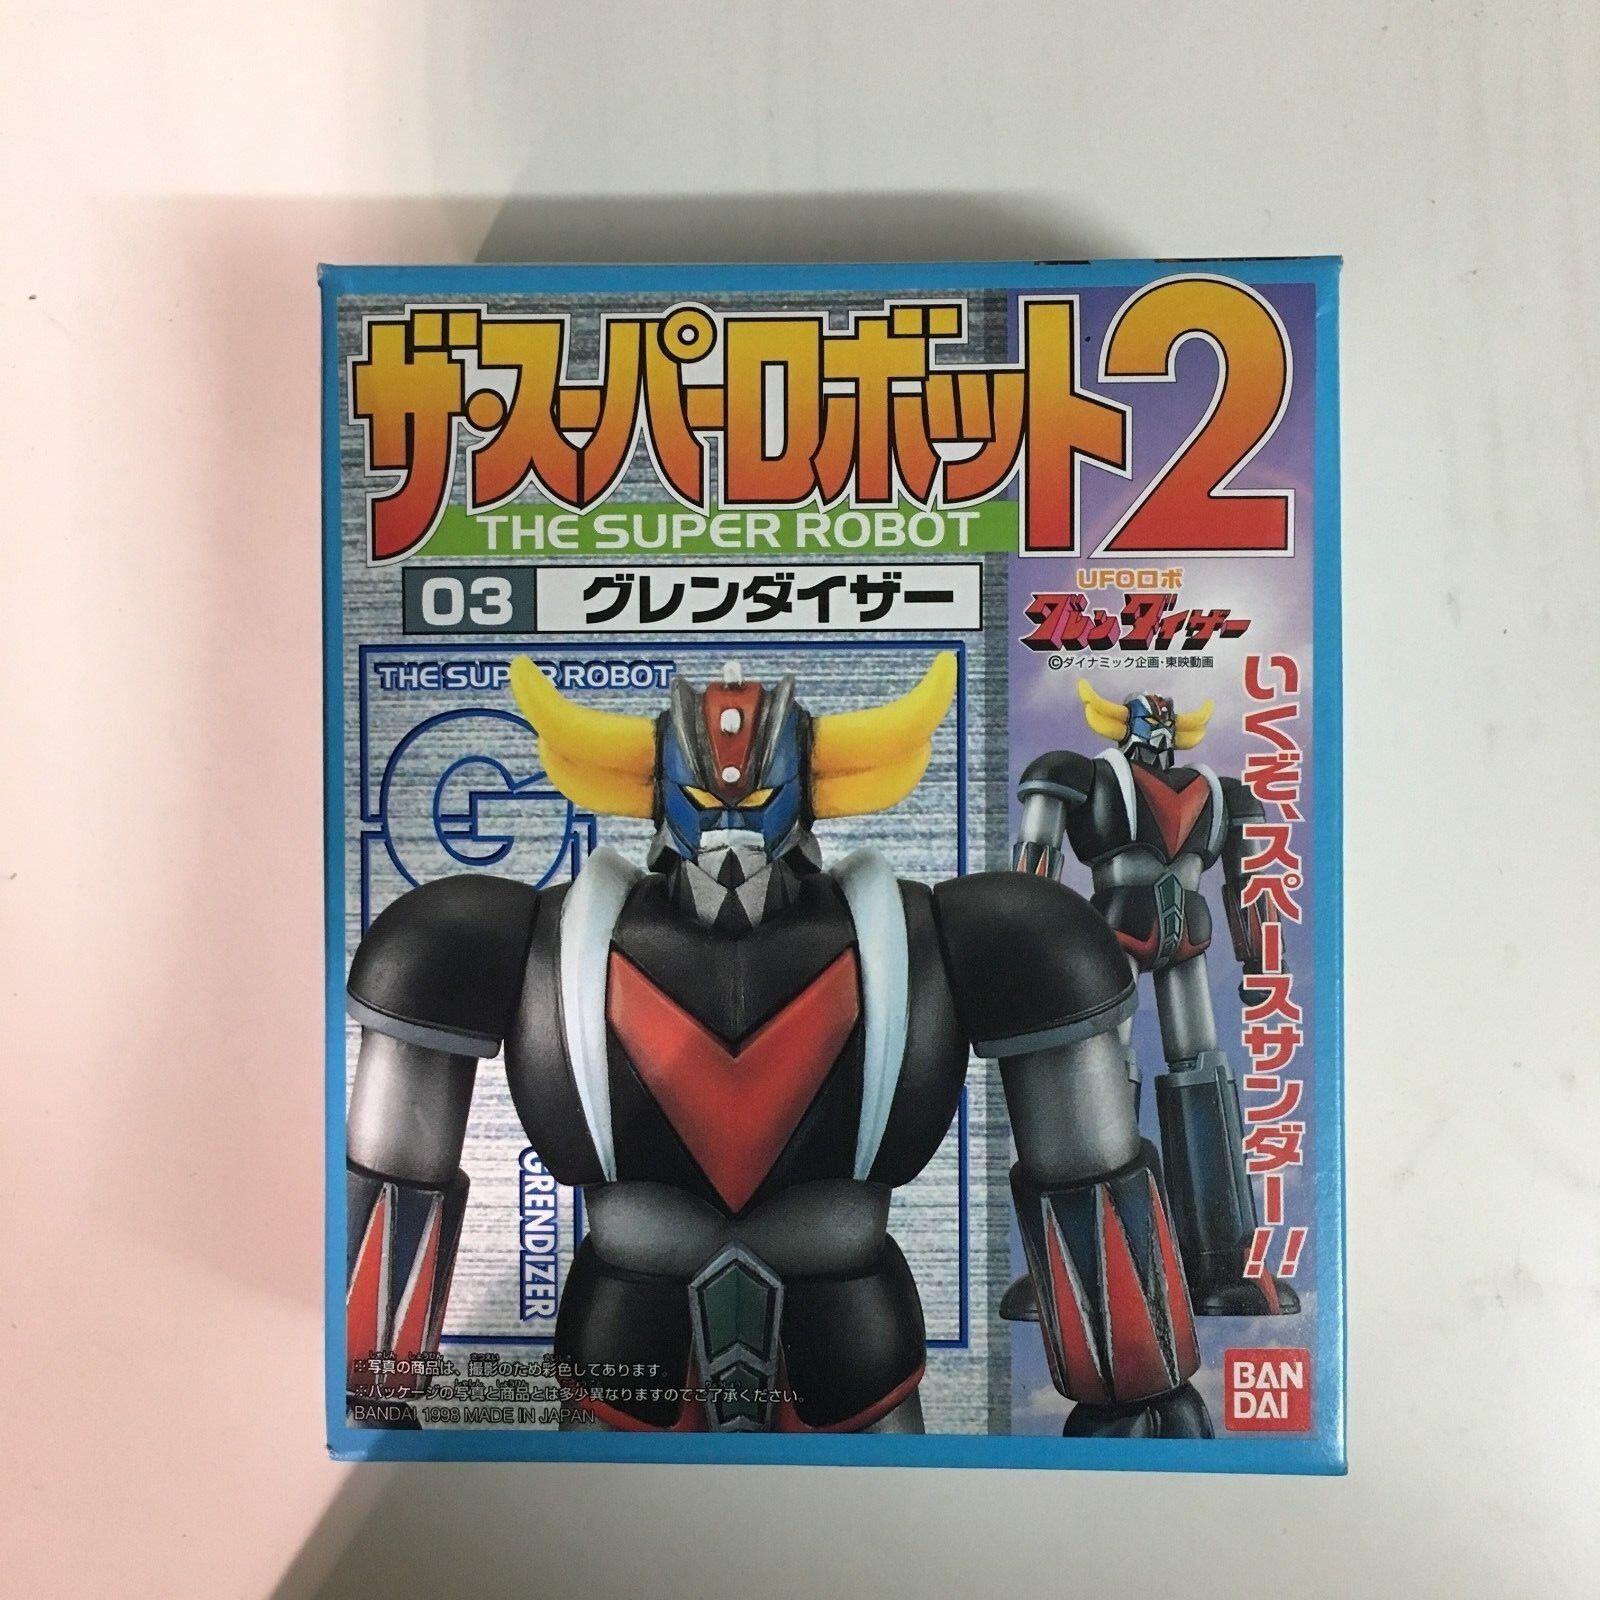 oroRAKE 2 Super Robot  03 Plastic modellololo Kit cifra BeAI 1998 JAPAN Anime  negozio di moda in vendita